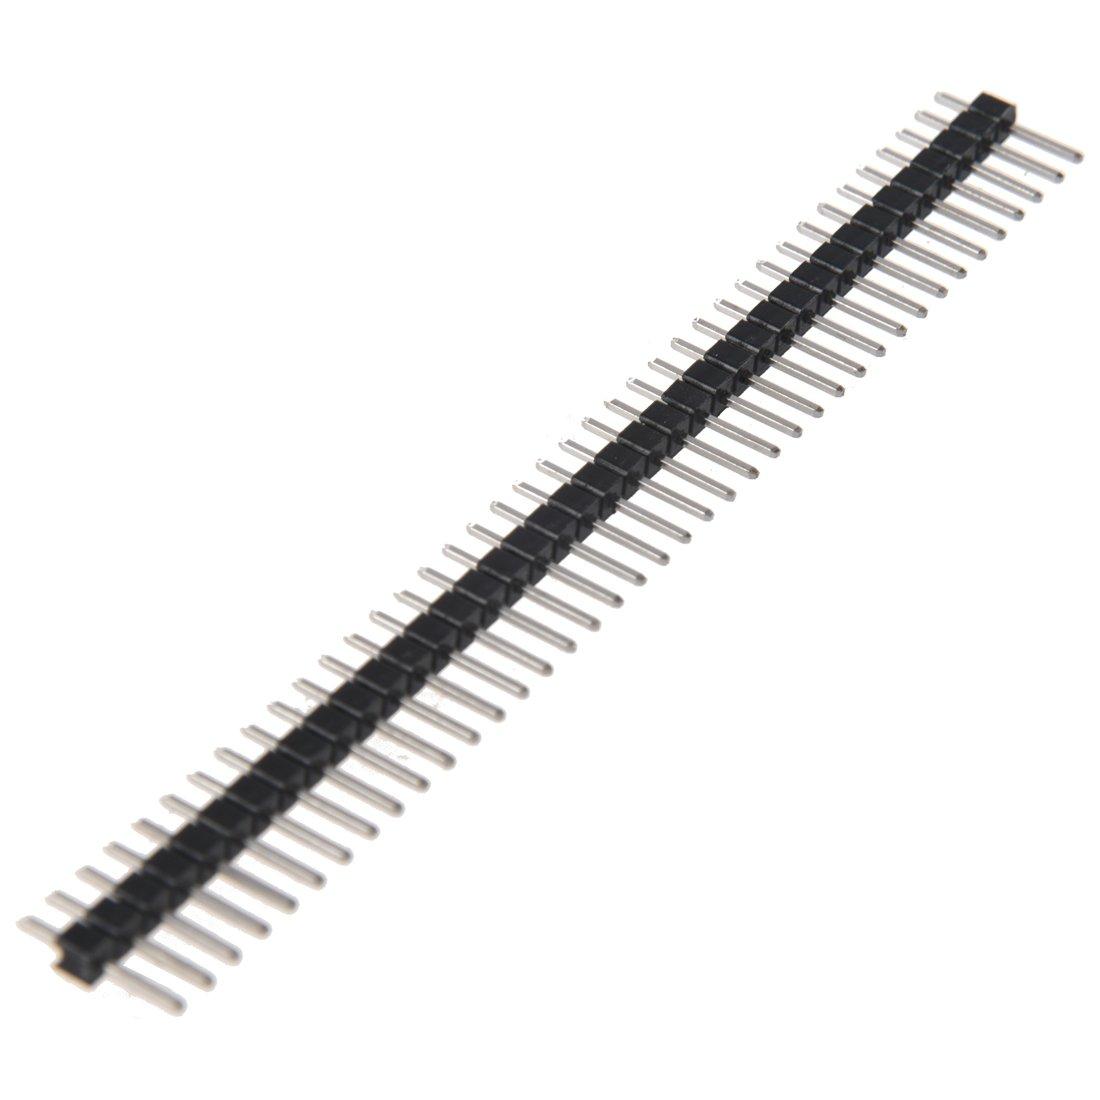 10 strisce da 40 pin da 2.54 mm